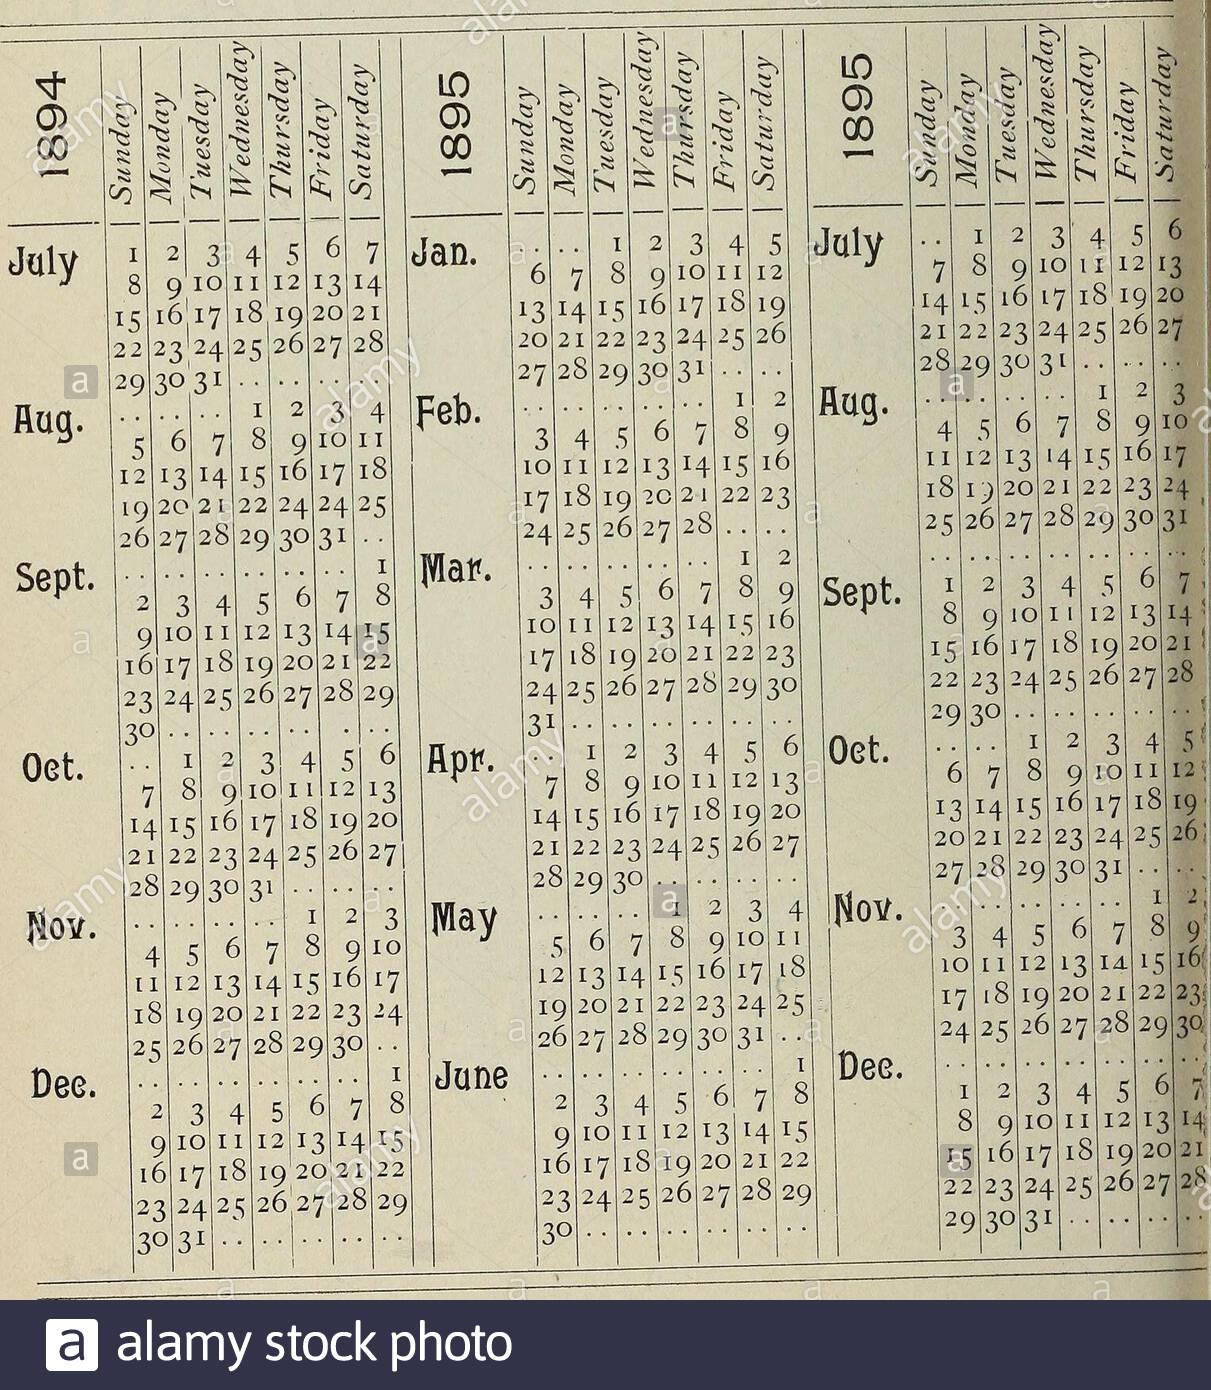 University Of Rhosde Island Calendar 20 21 | Printable With Regard To Gsu Academic Calendar 2021 2020